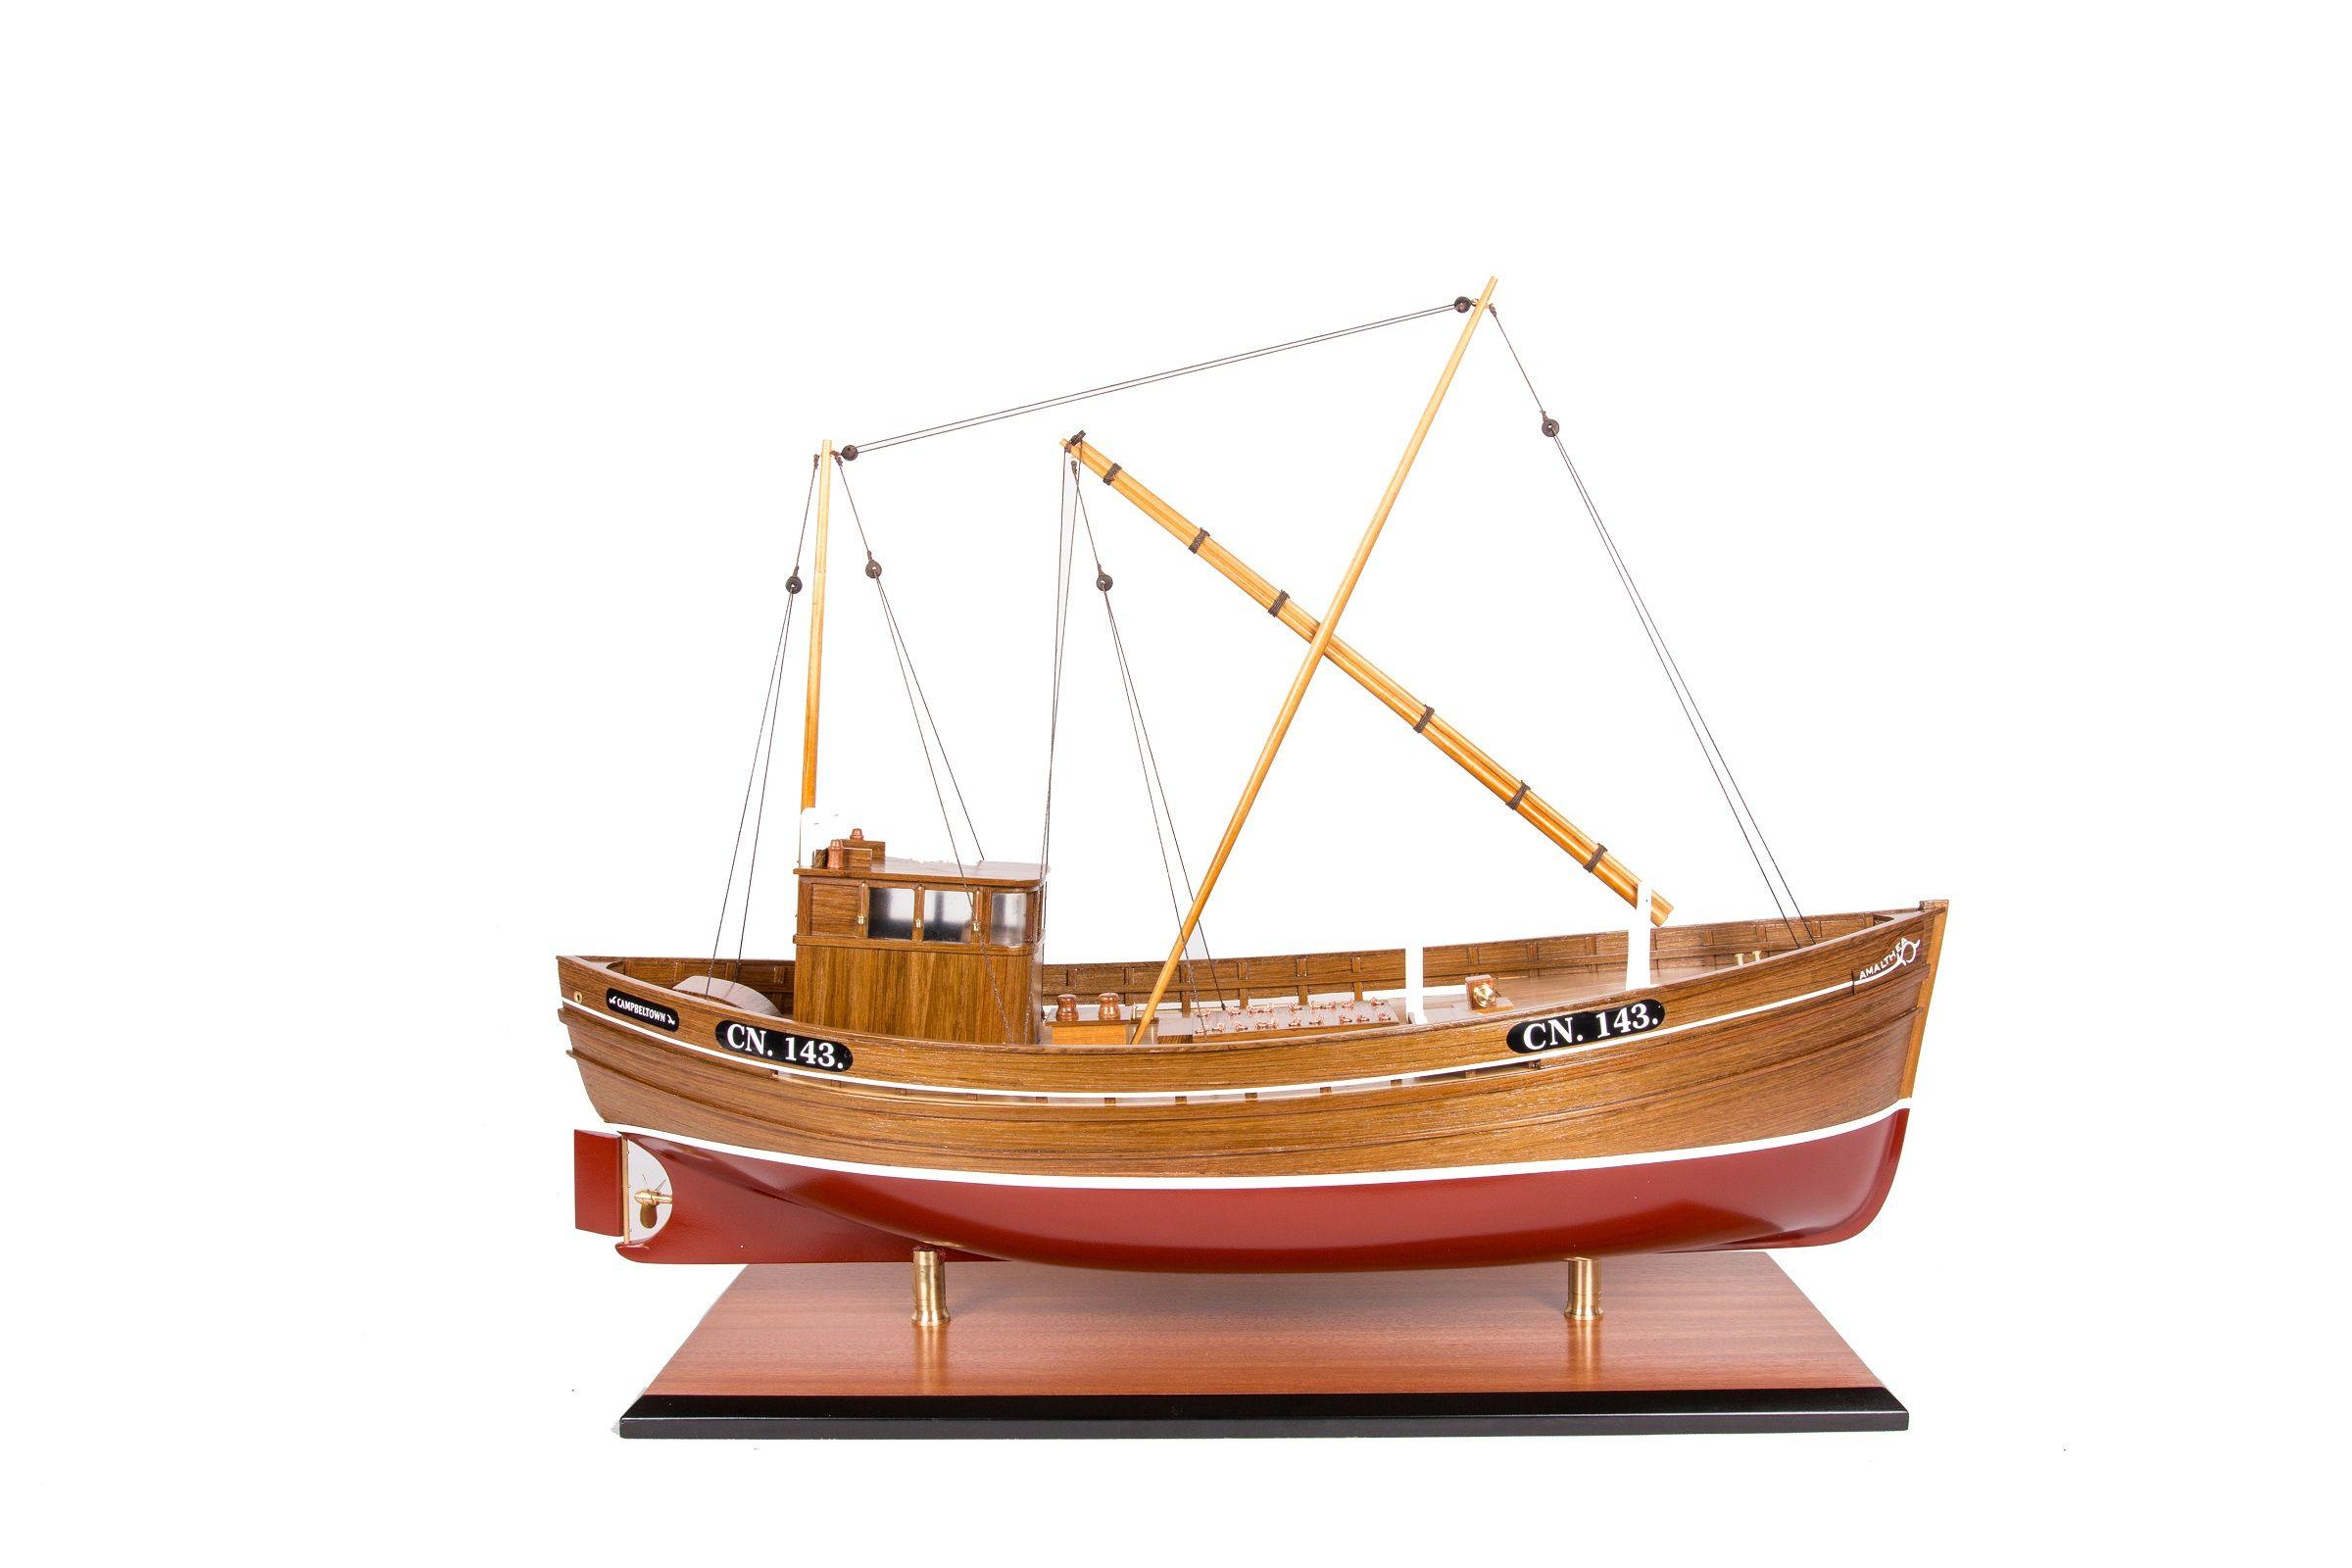 1666-9363-Amalthea-CN-143-Model-Boat